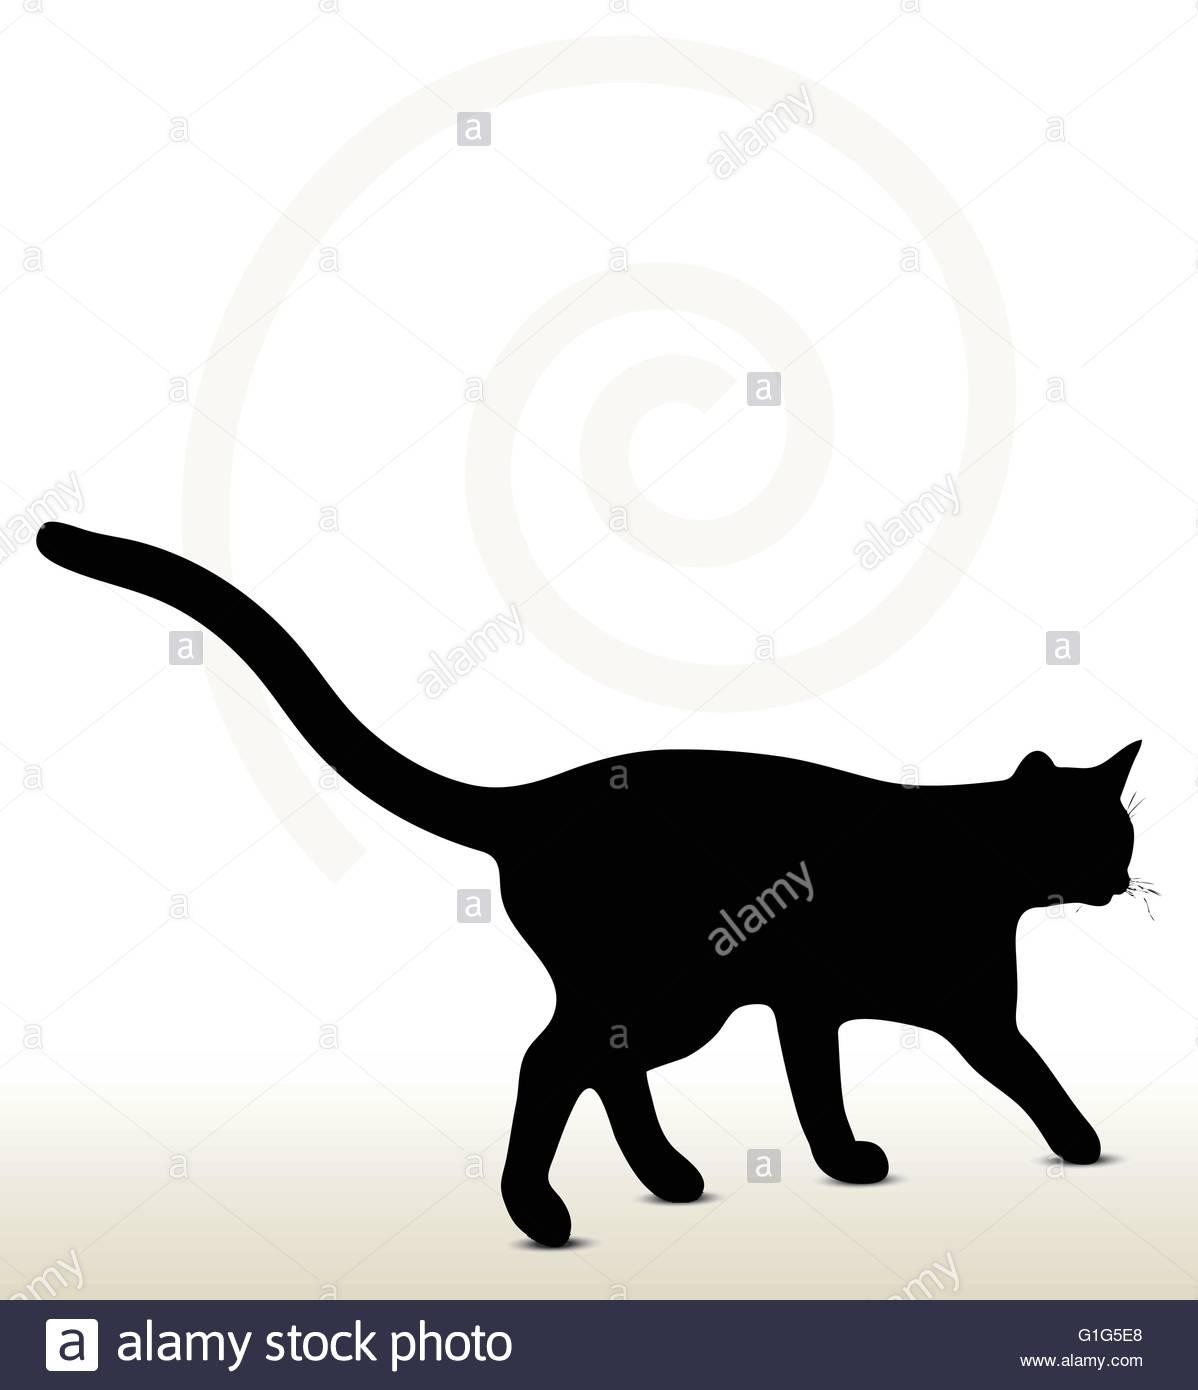 1198x1390 Black Cat Walking Stock Vector Images